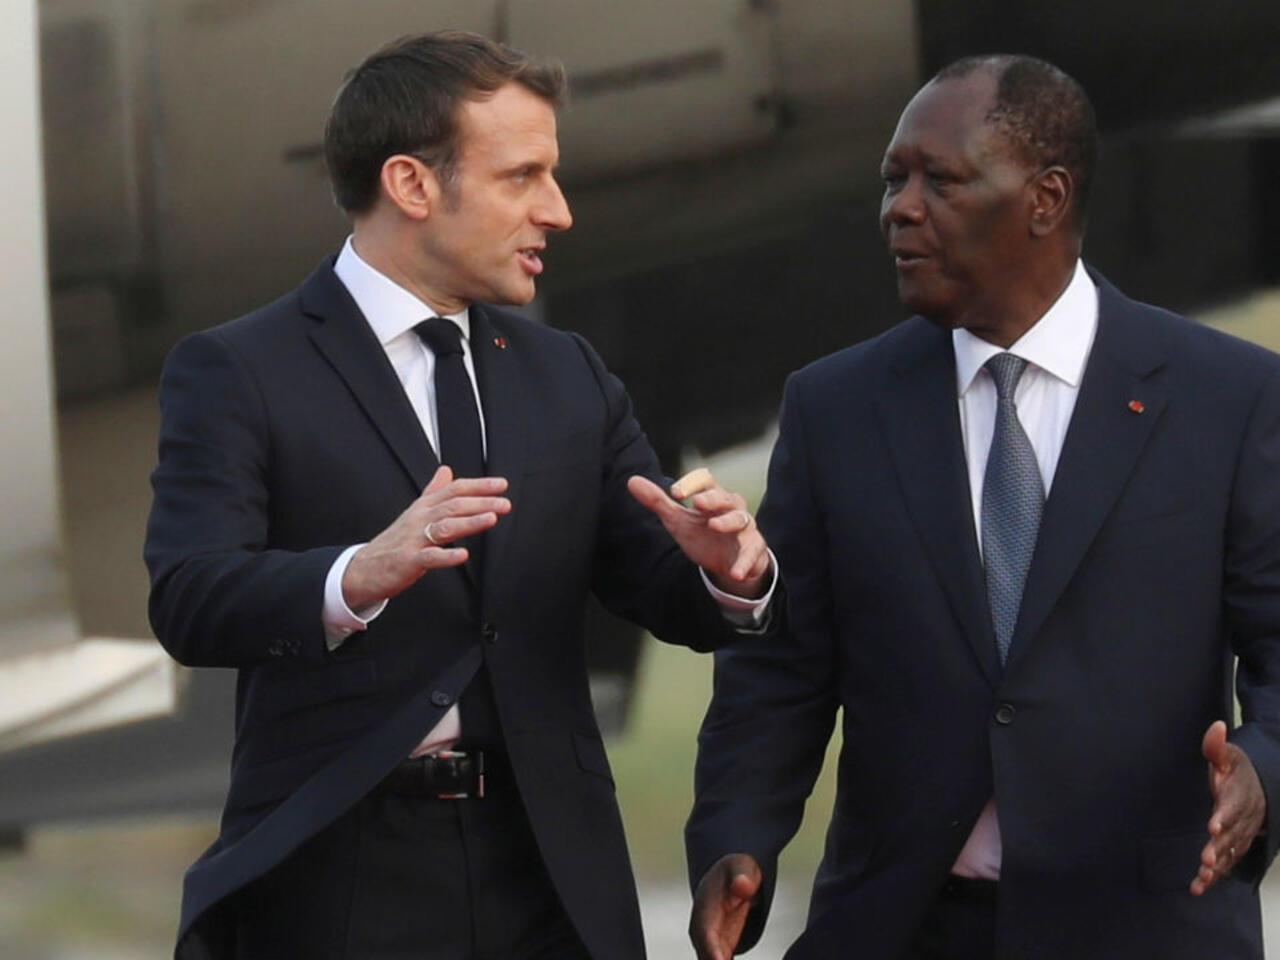 A Abidjan Emmanuel Macron Veut Renforcer Les Relations Franco Ivoiriennes